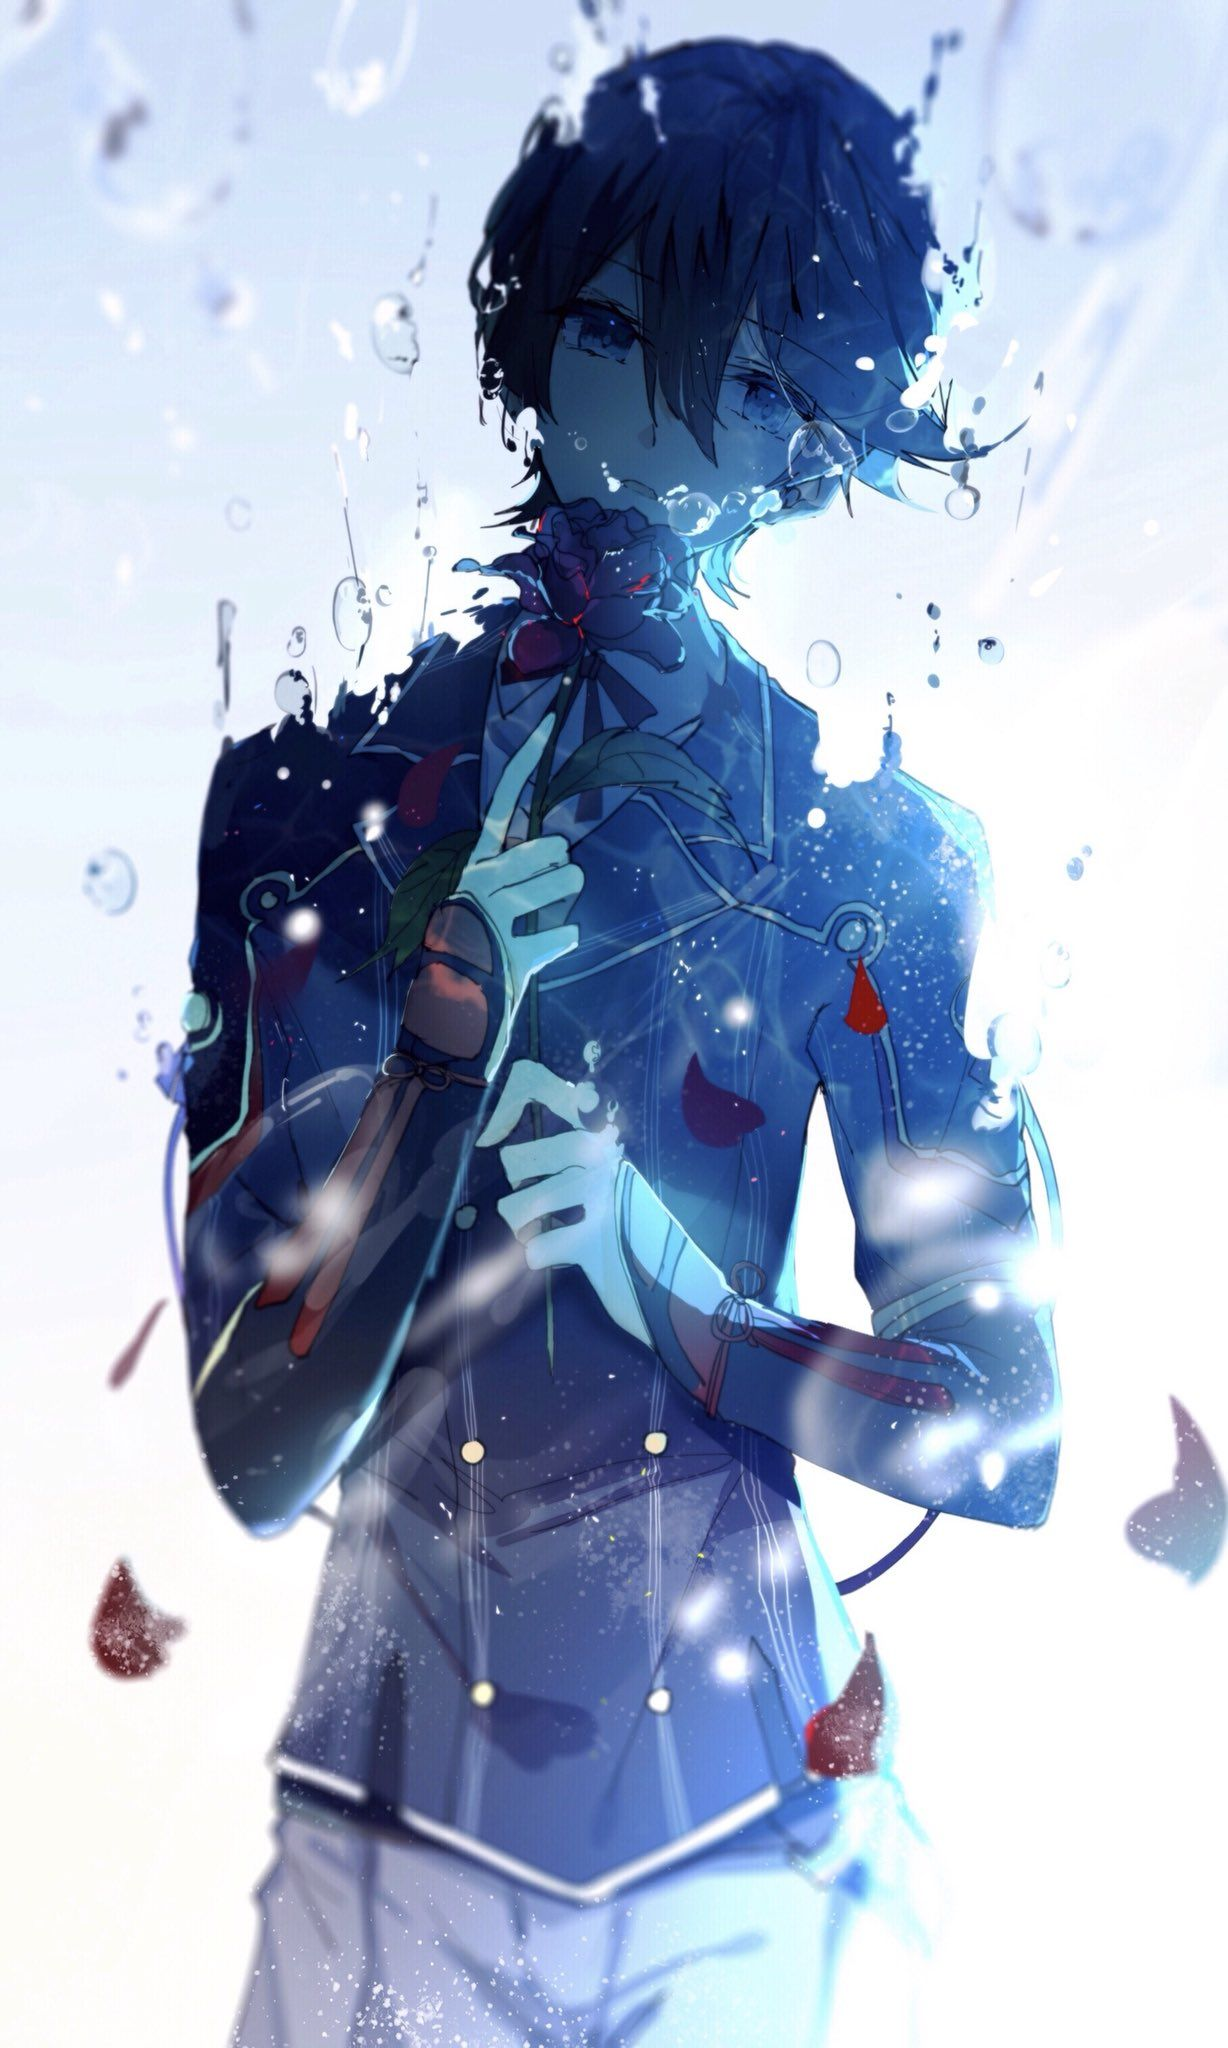 Anime Guy Blue Epic Anime Art Blue Eyes Water Blue Anime Cute Anime Guys Cute Anime Boy